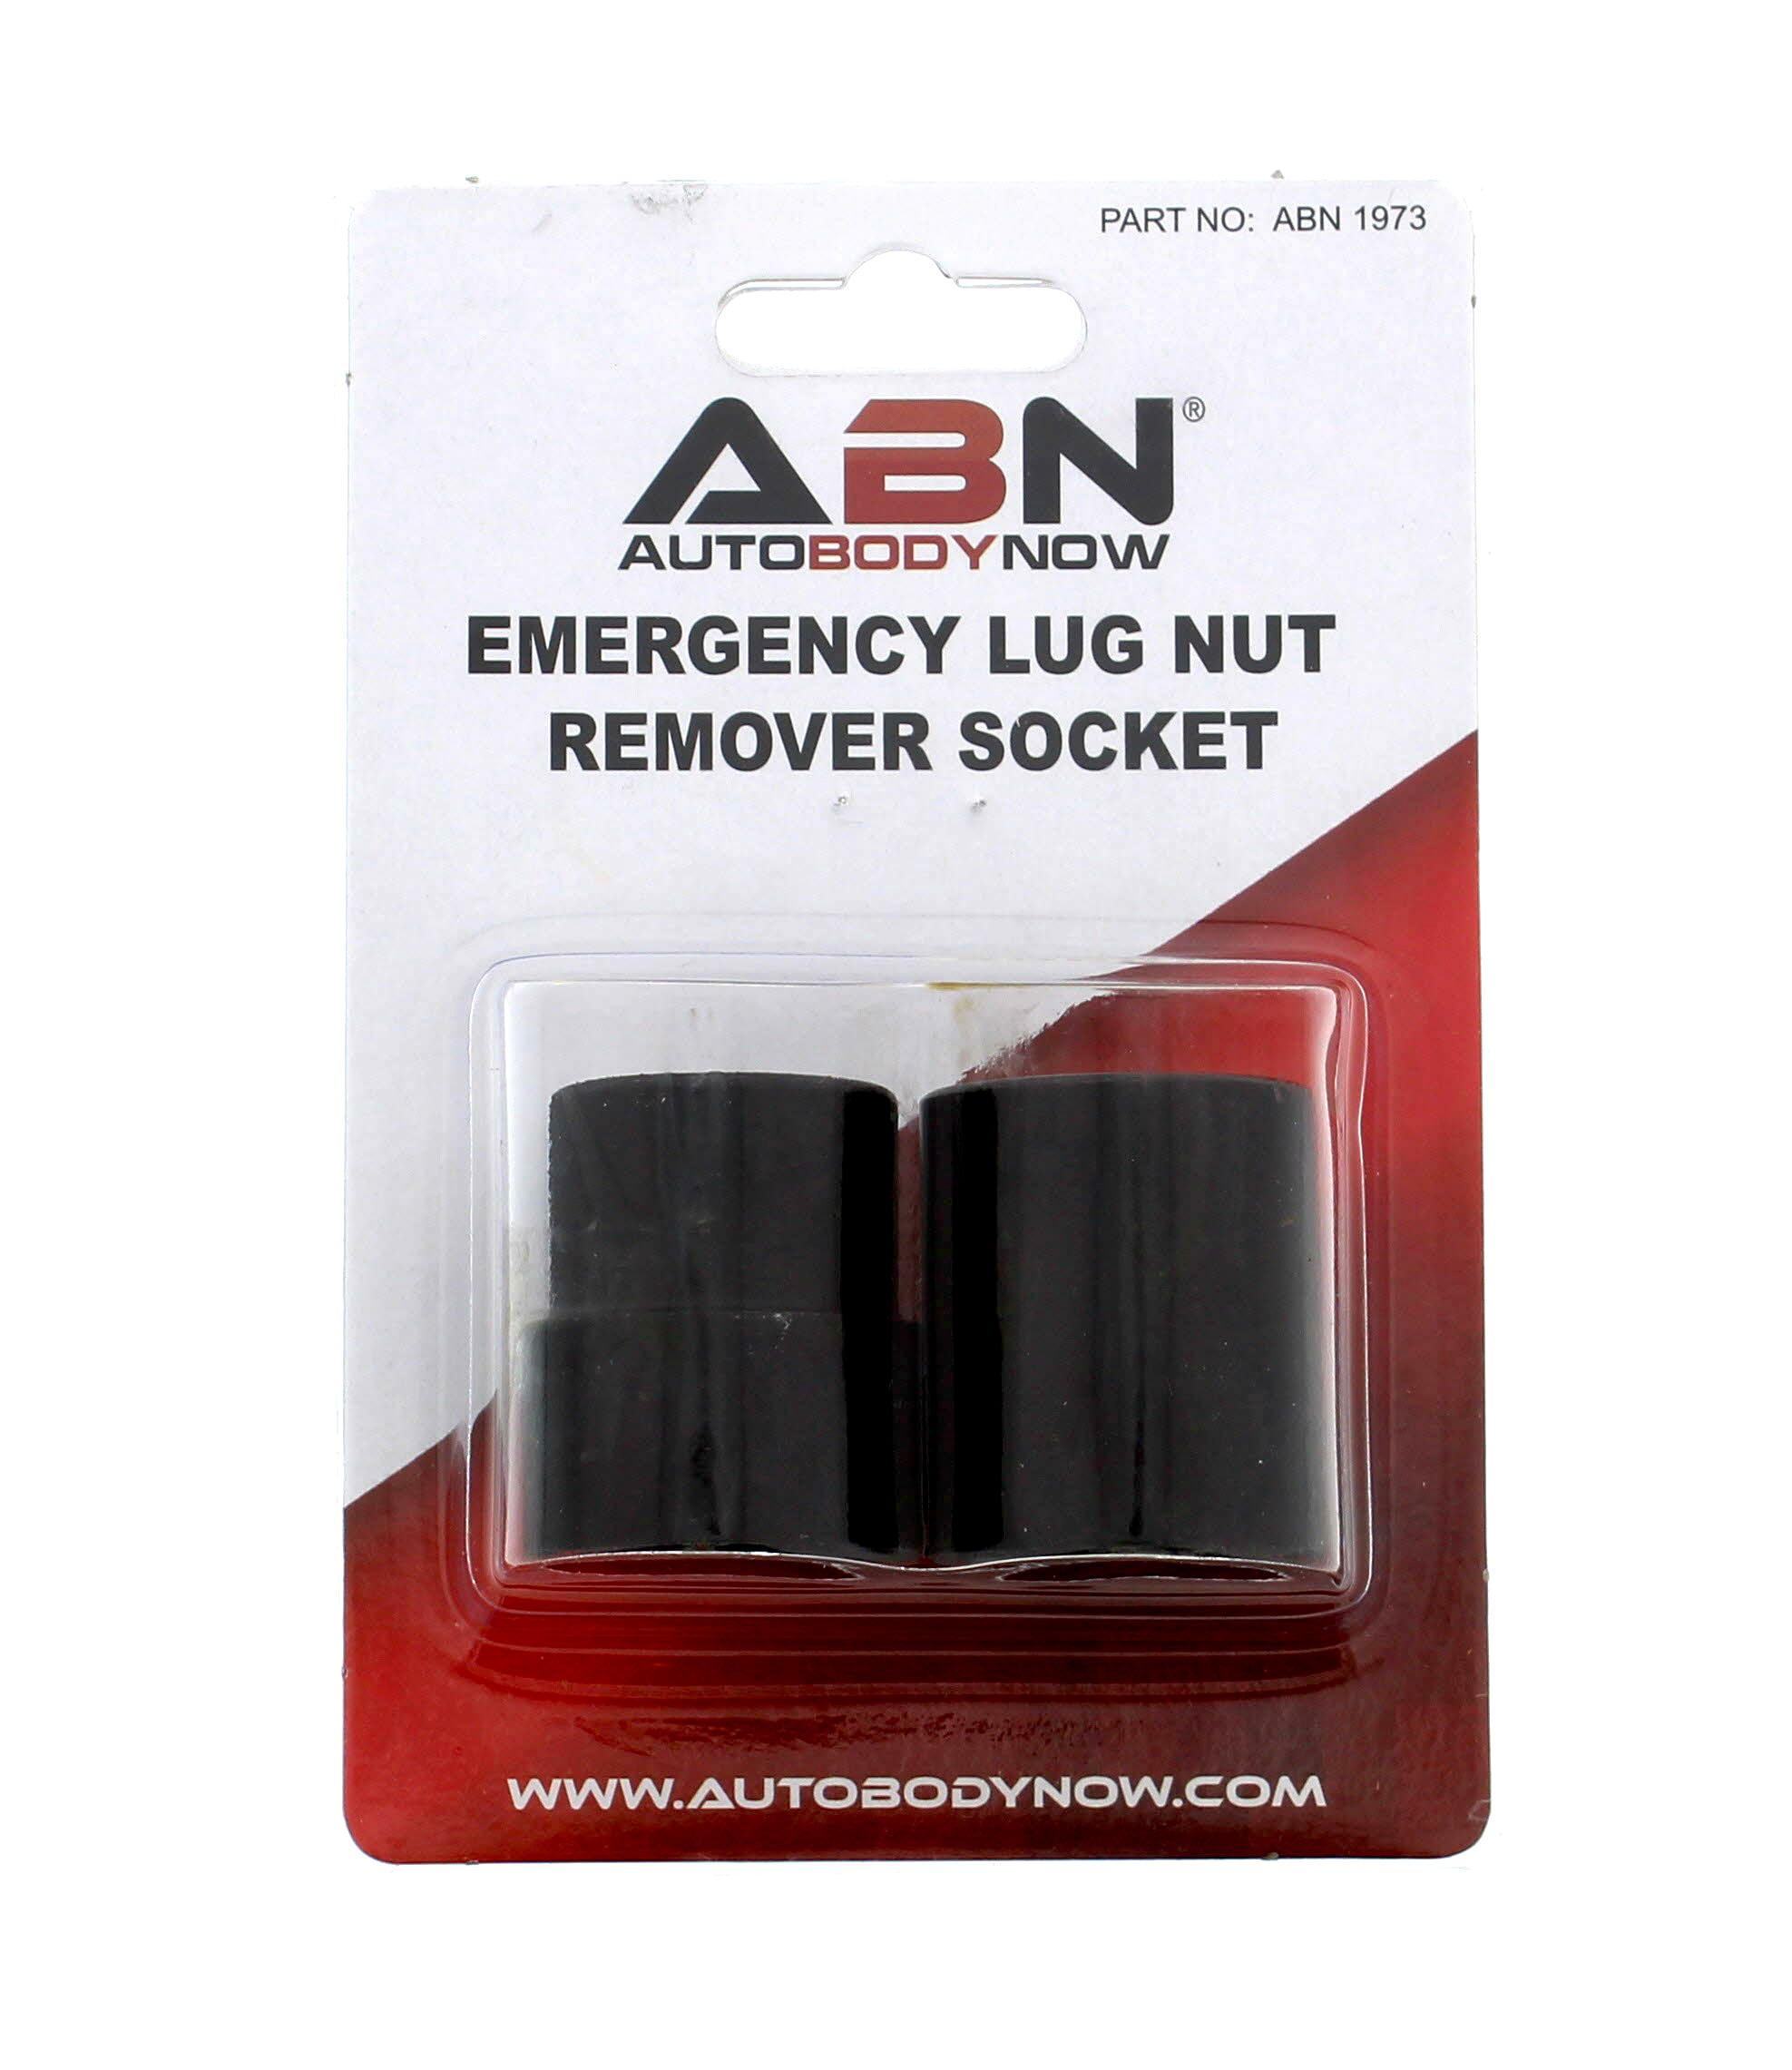 Abn Emergency Lug Nut Remover Socket Set For Stripped Lugnut Removal